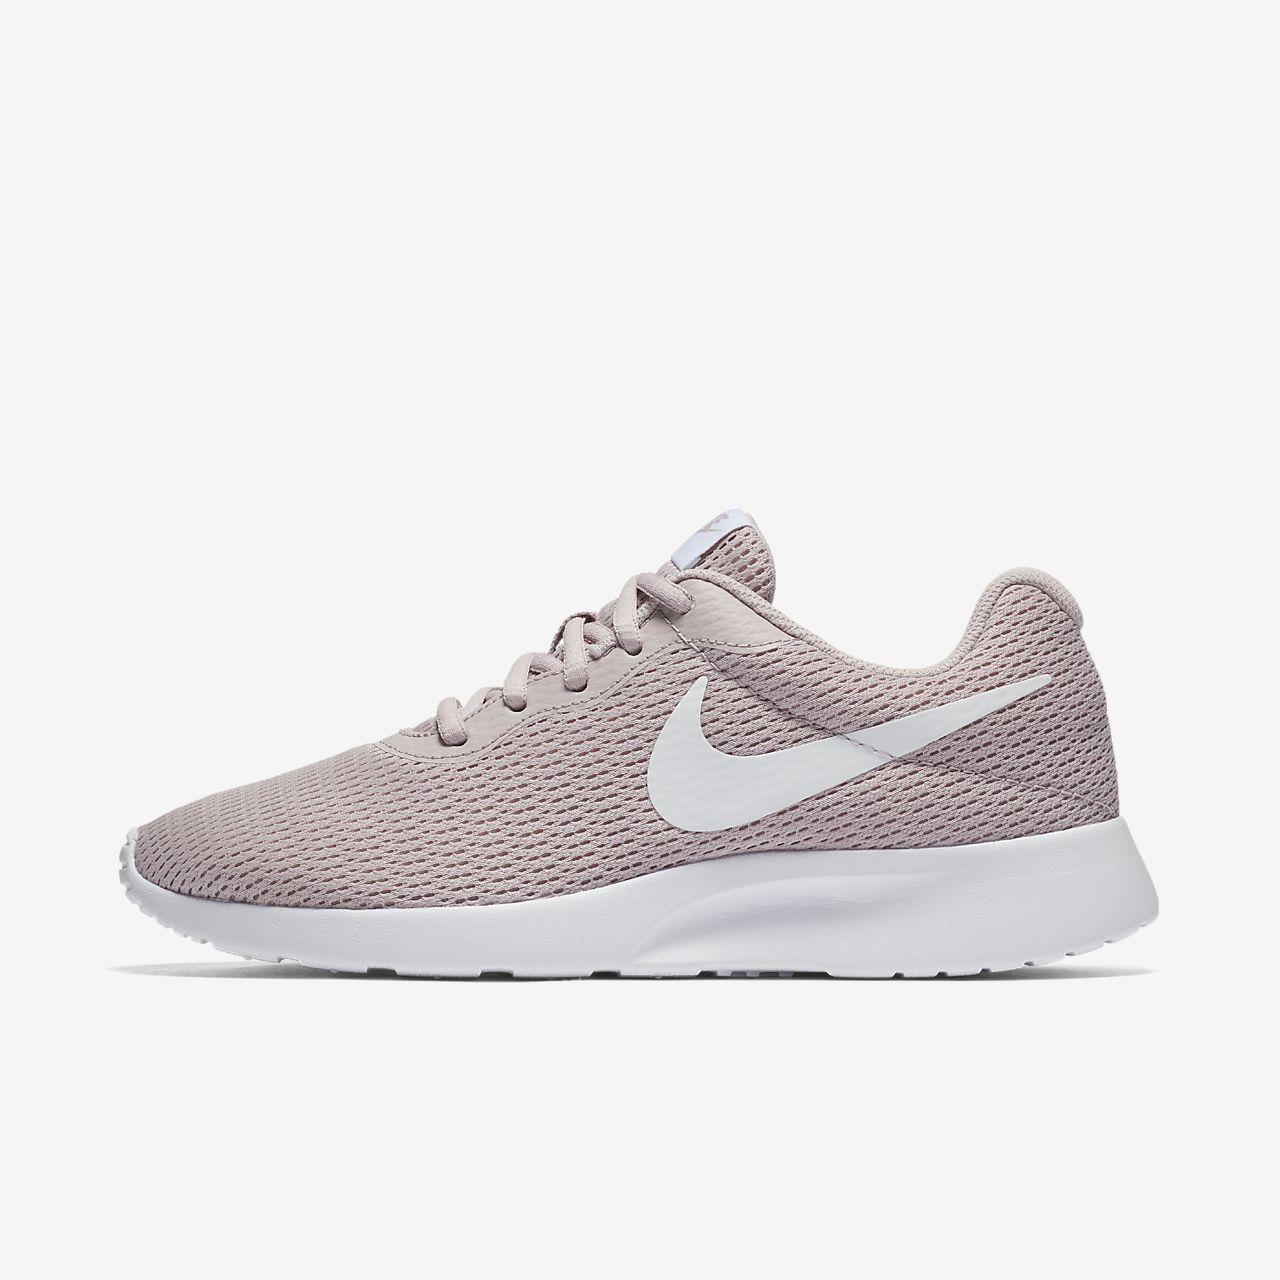 Cheap Nike Tanjun Shoes